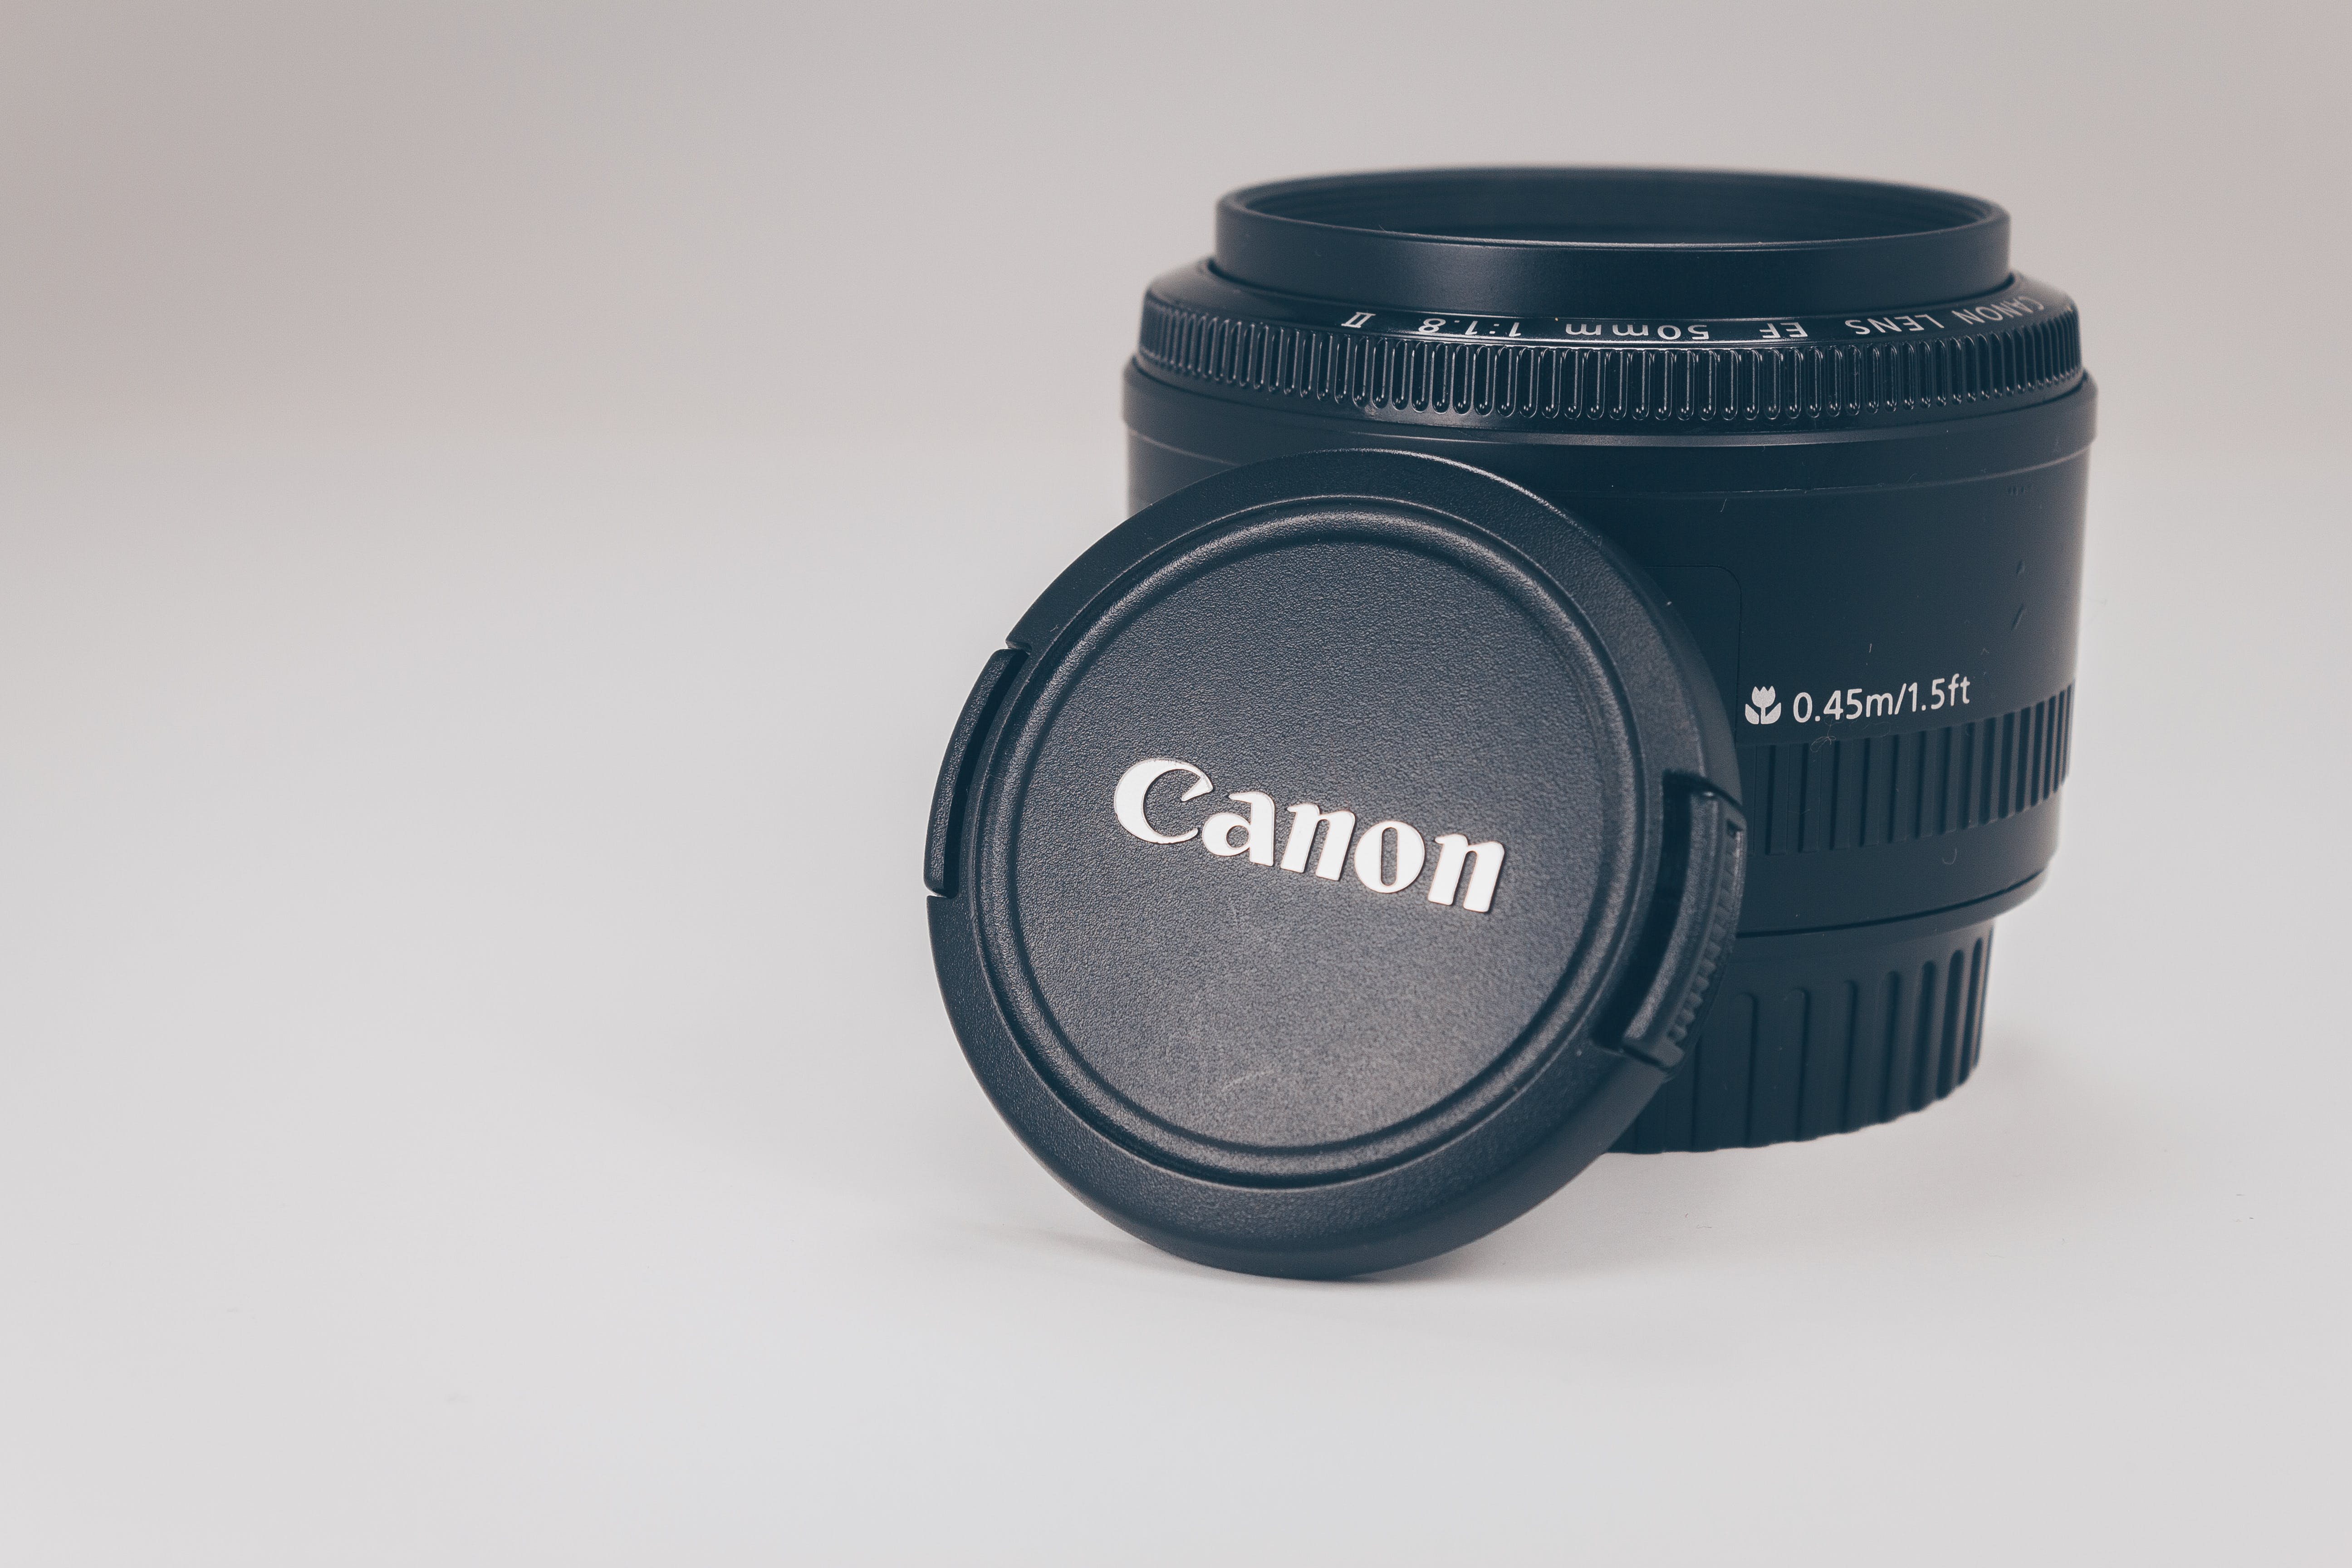 Black Canon Camera Lens